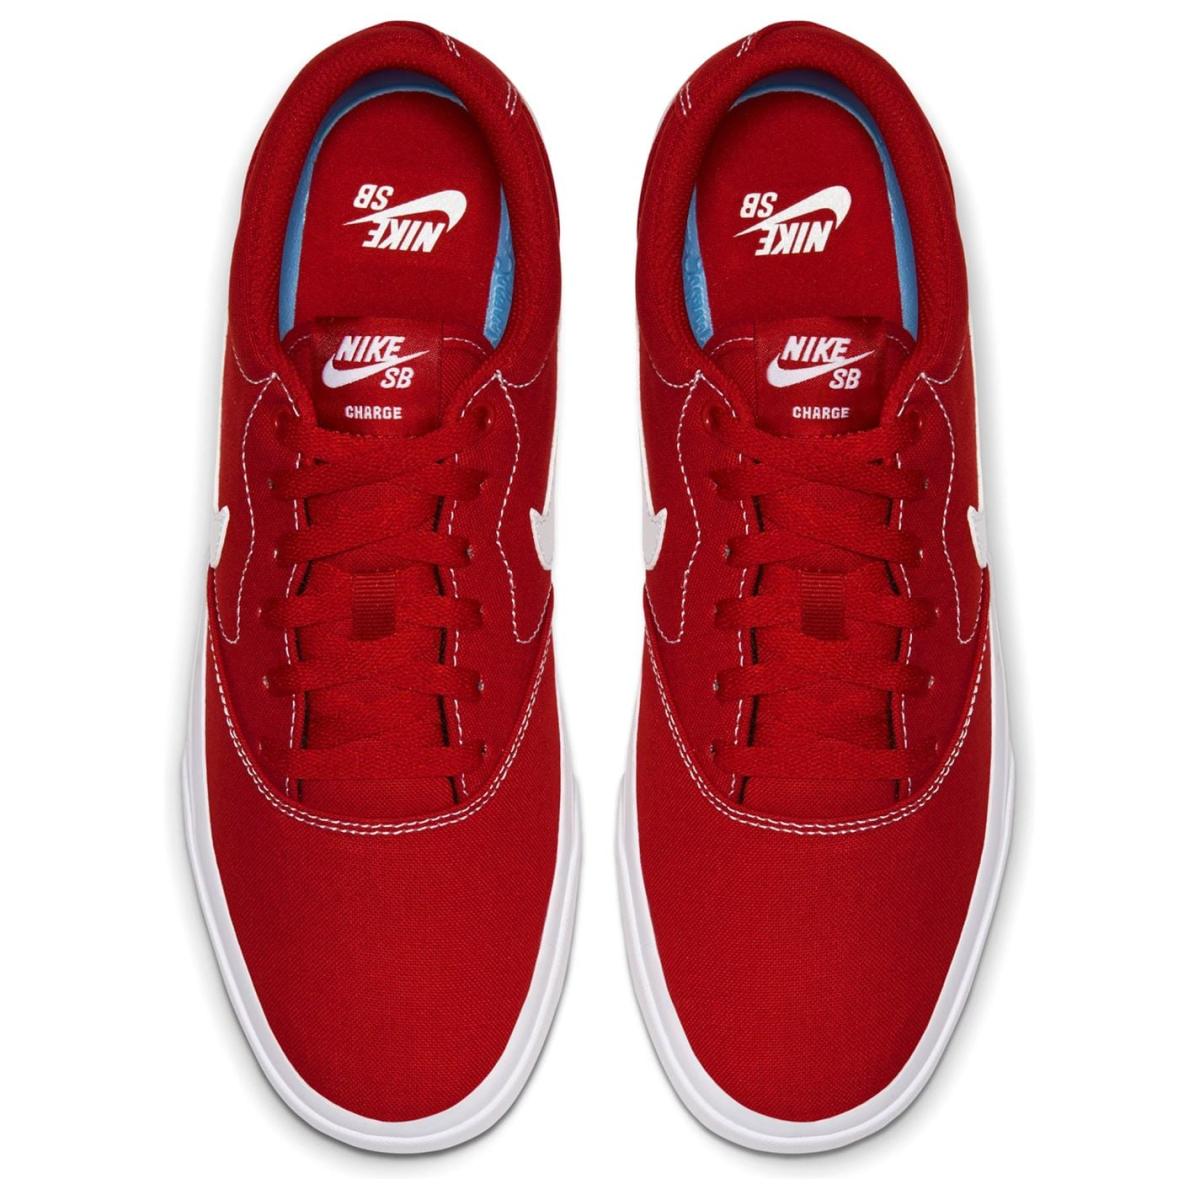 Nike-SB-Lot-Solarsoft-Skate-Chaussures-Messieurs-Skater-Chaussures-De-Sport-Skate-2162 miniature 57